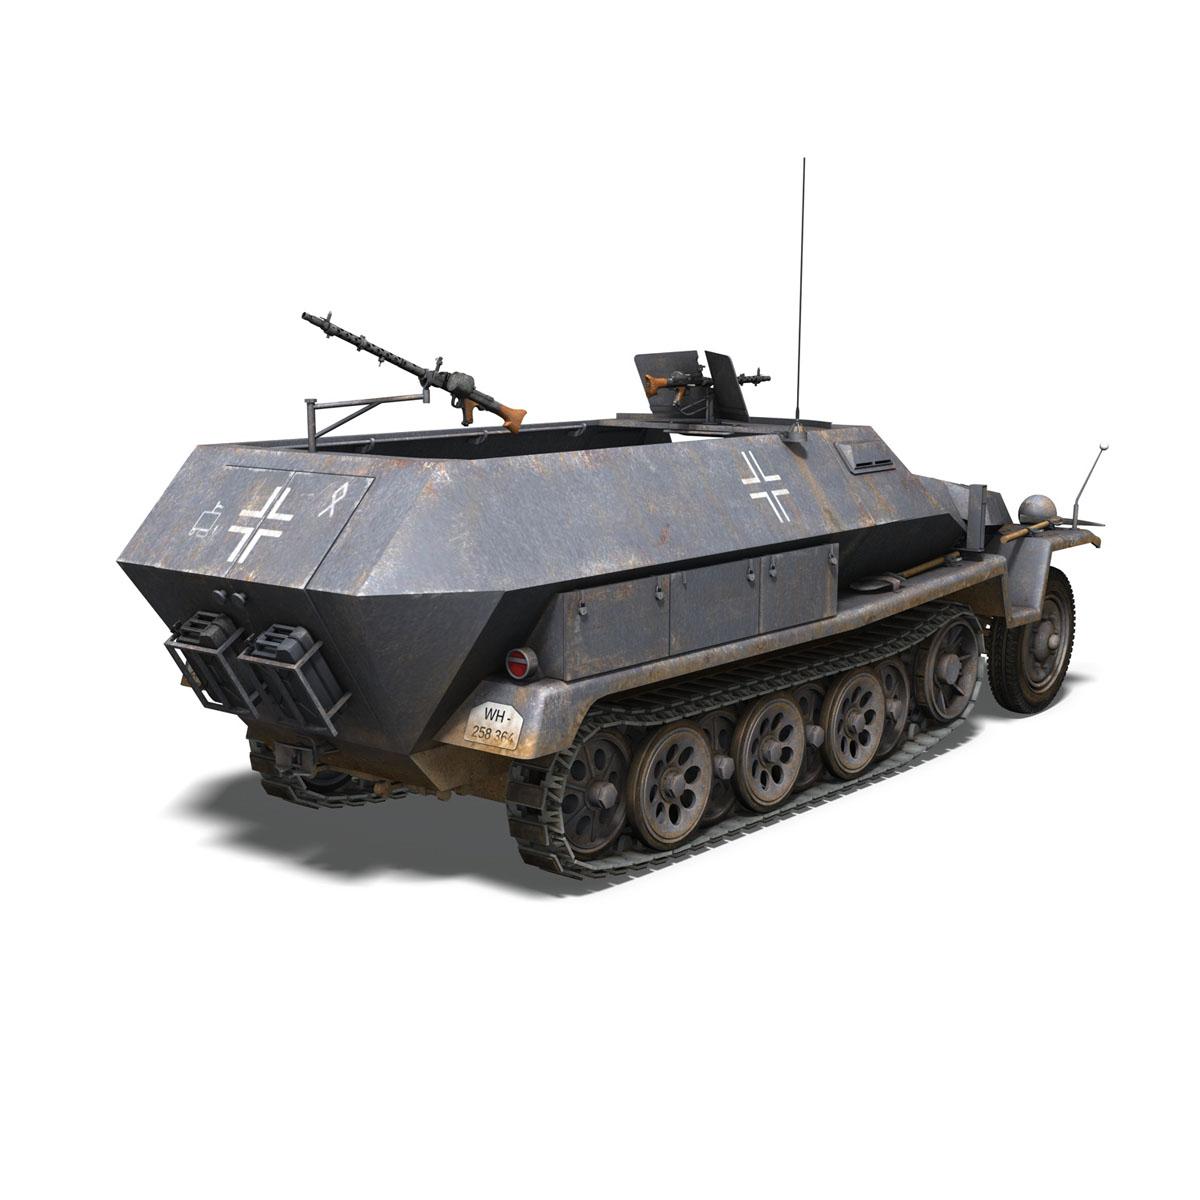 sd.kfz 251 1 ausf.c – half-track 3d model 3ds fbx c4d lwo obj 201395